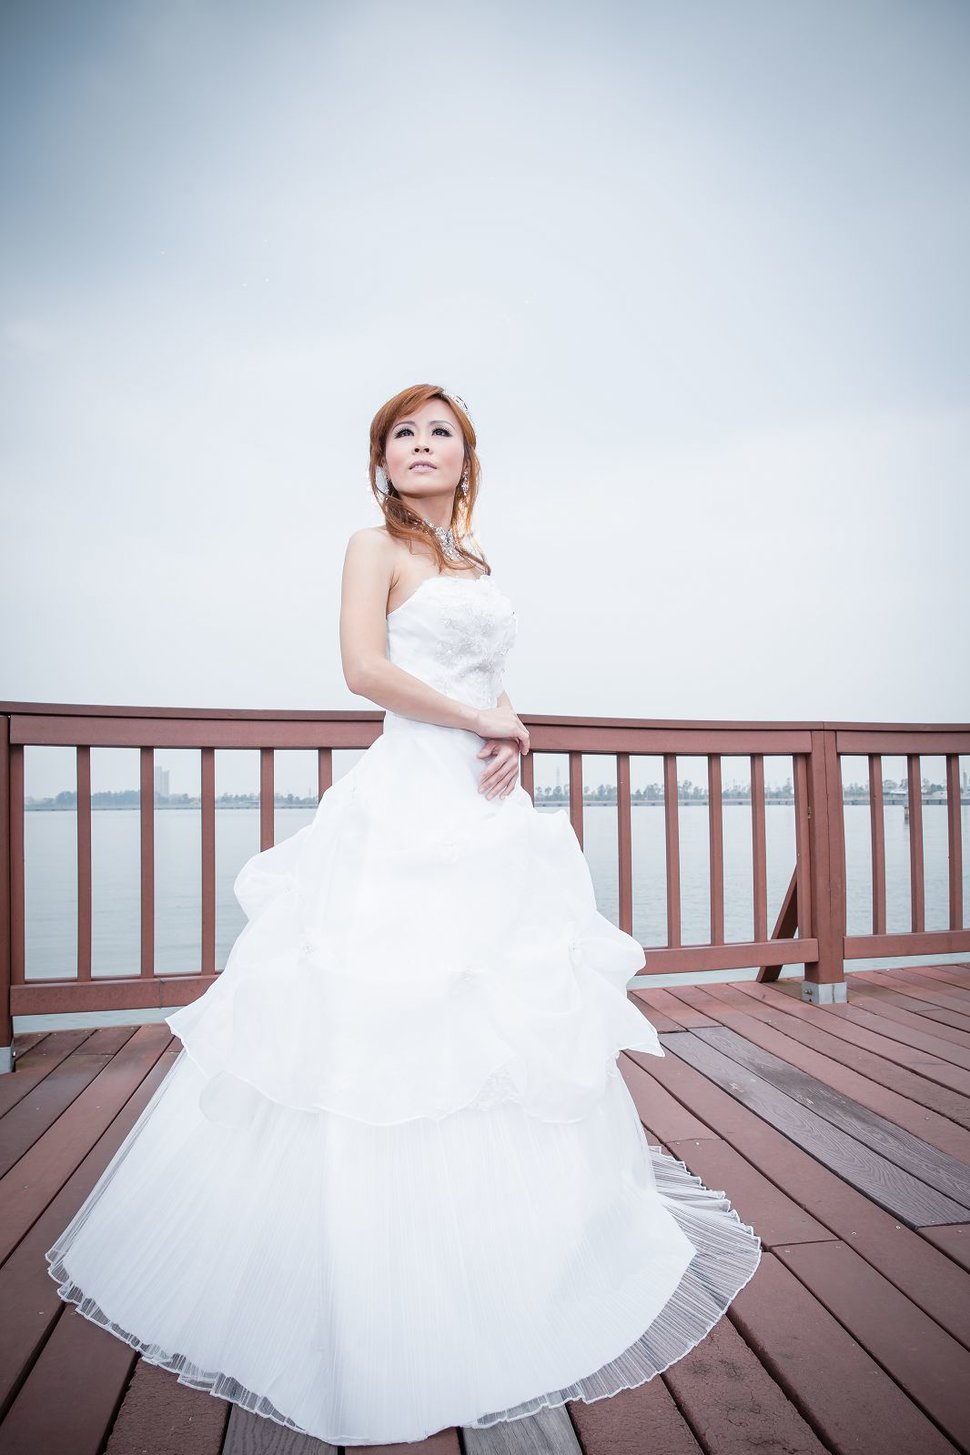 _MG_5967 - 全台最便宜-45DESIGN四五婚紗禮服《結婚吧》